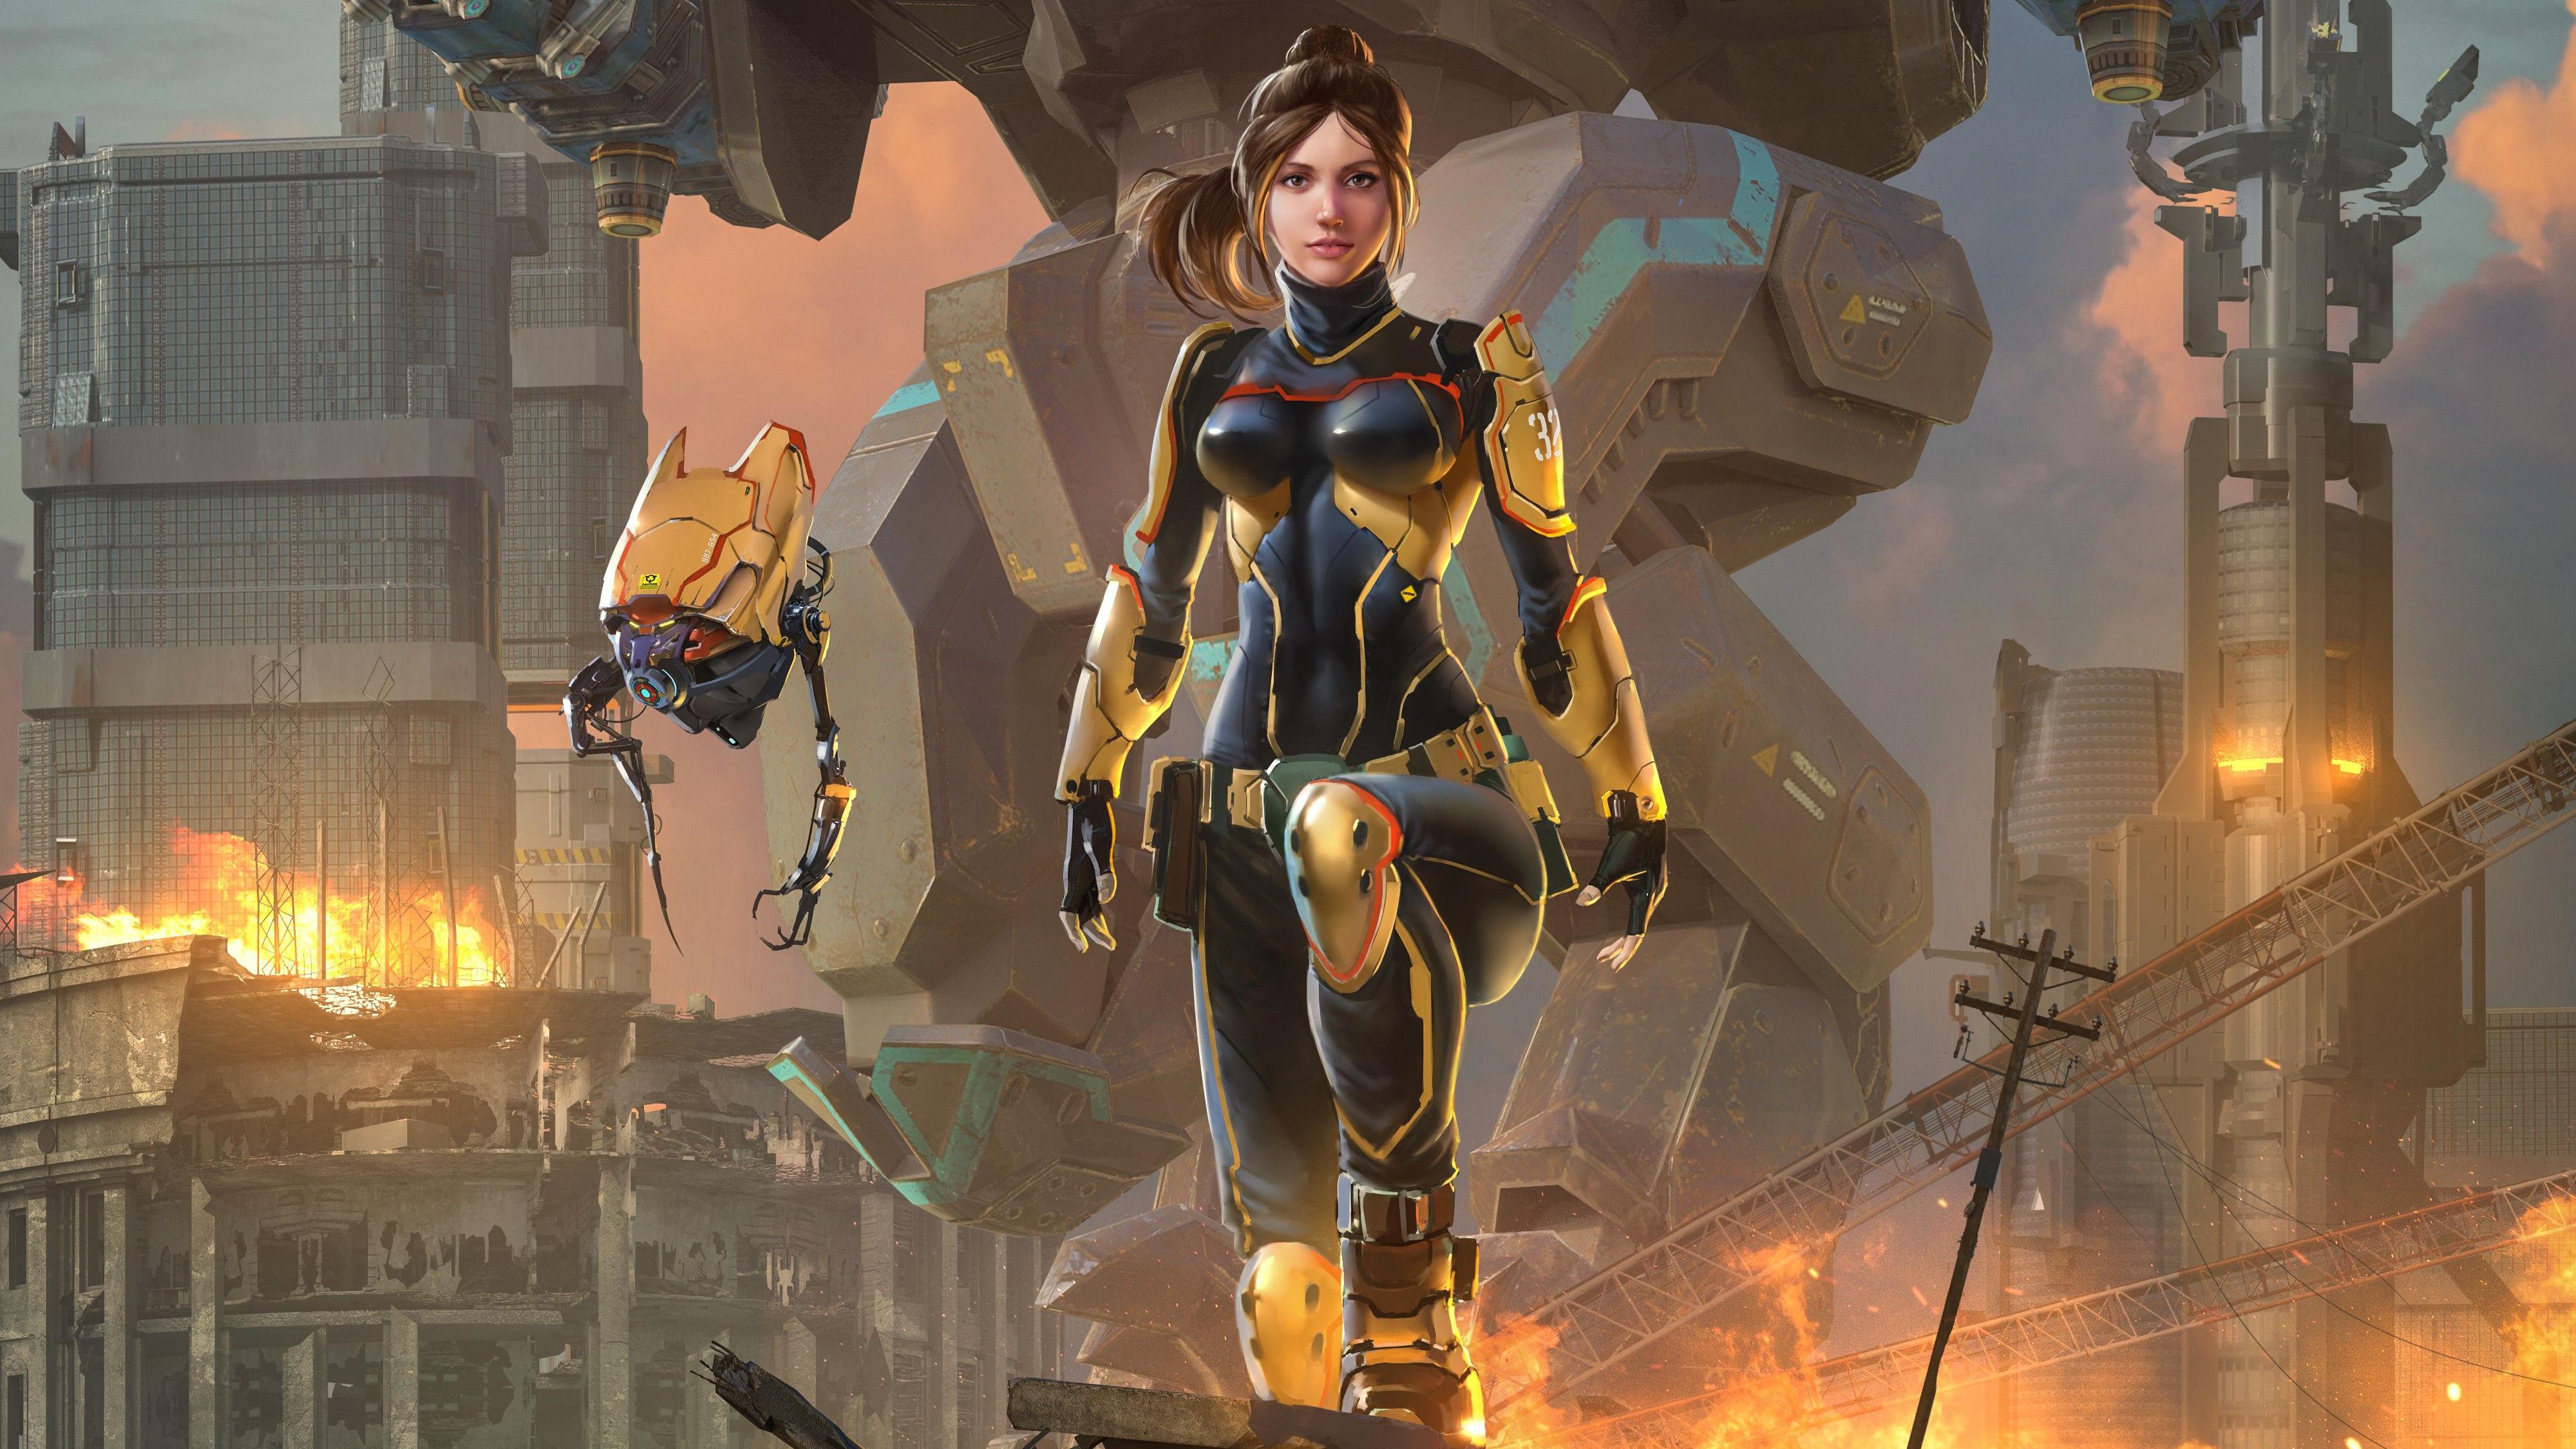 Warrior Fantasy Girl With Robot 4k HD Fantasy Girls 4k